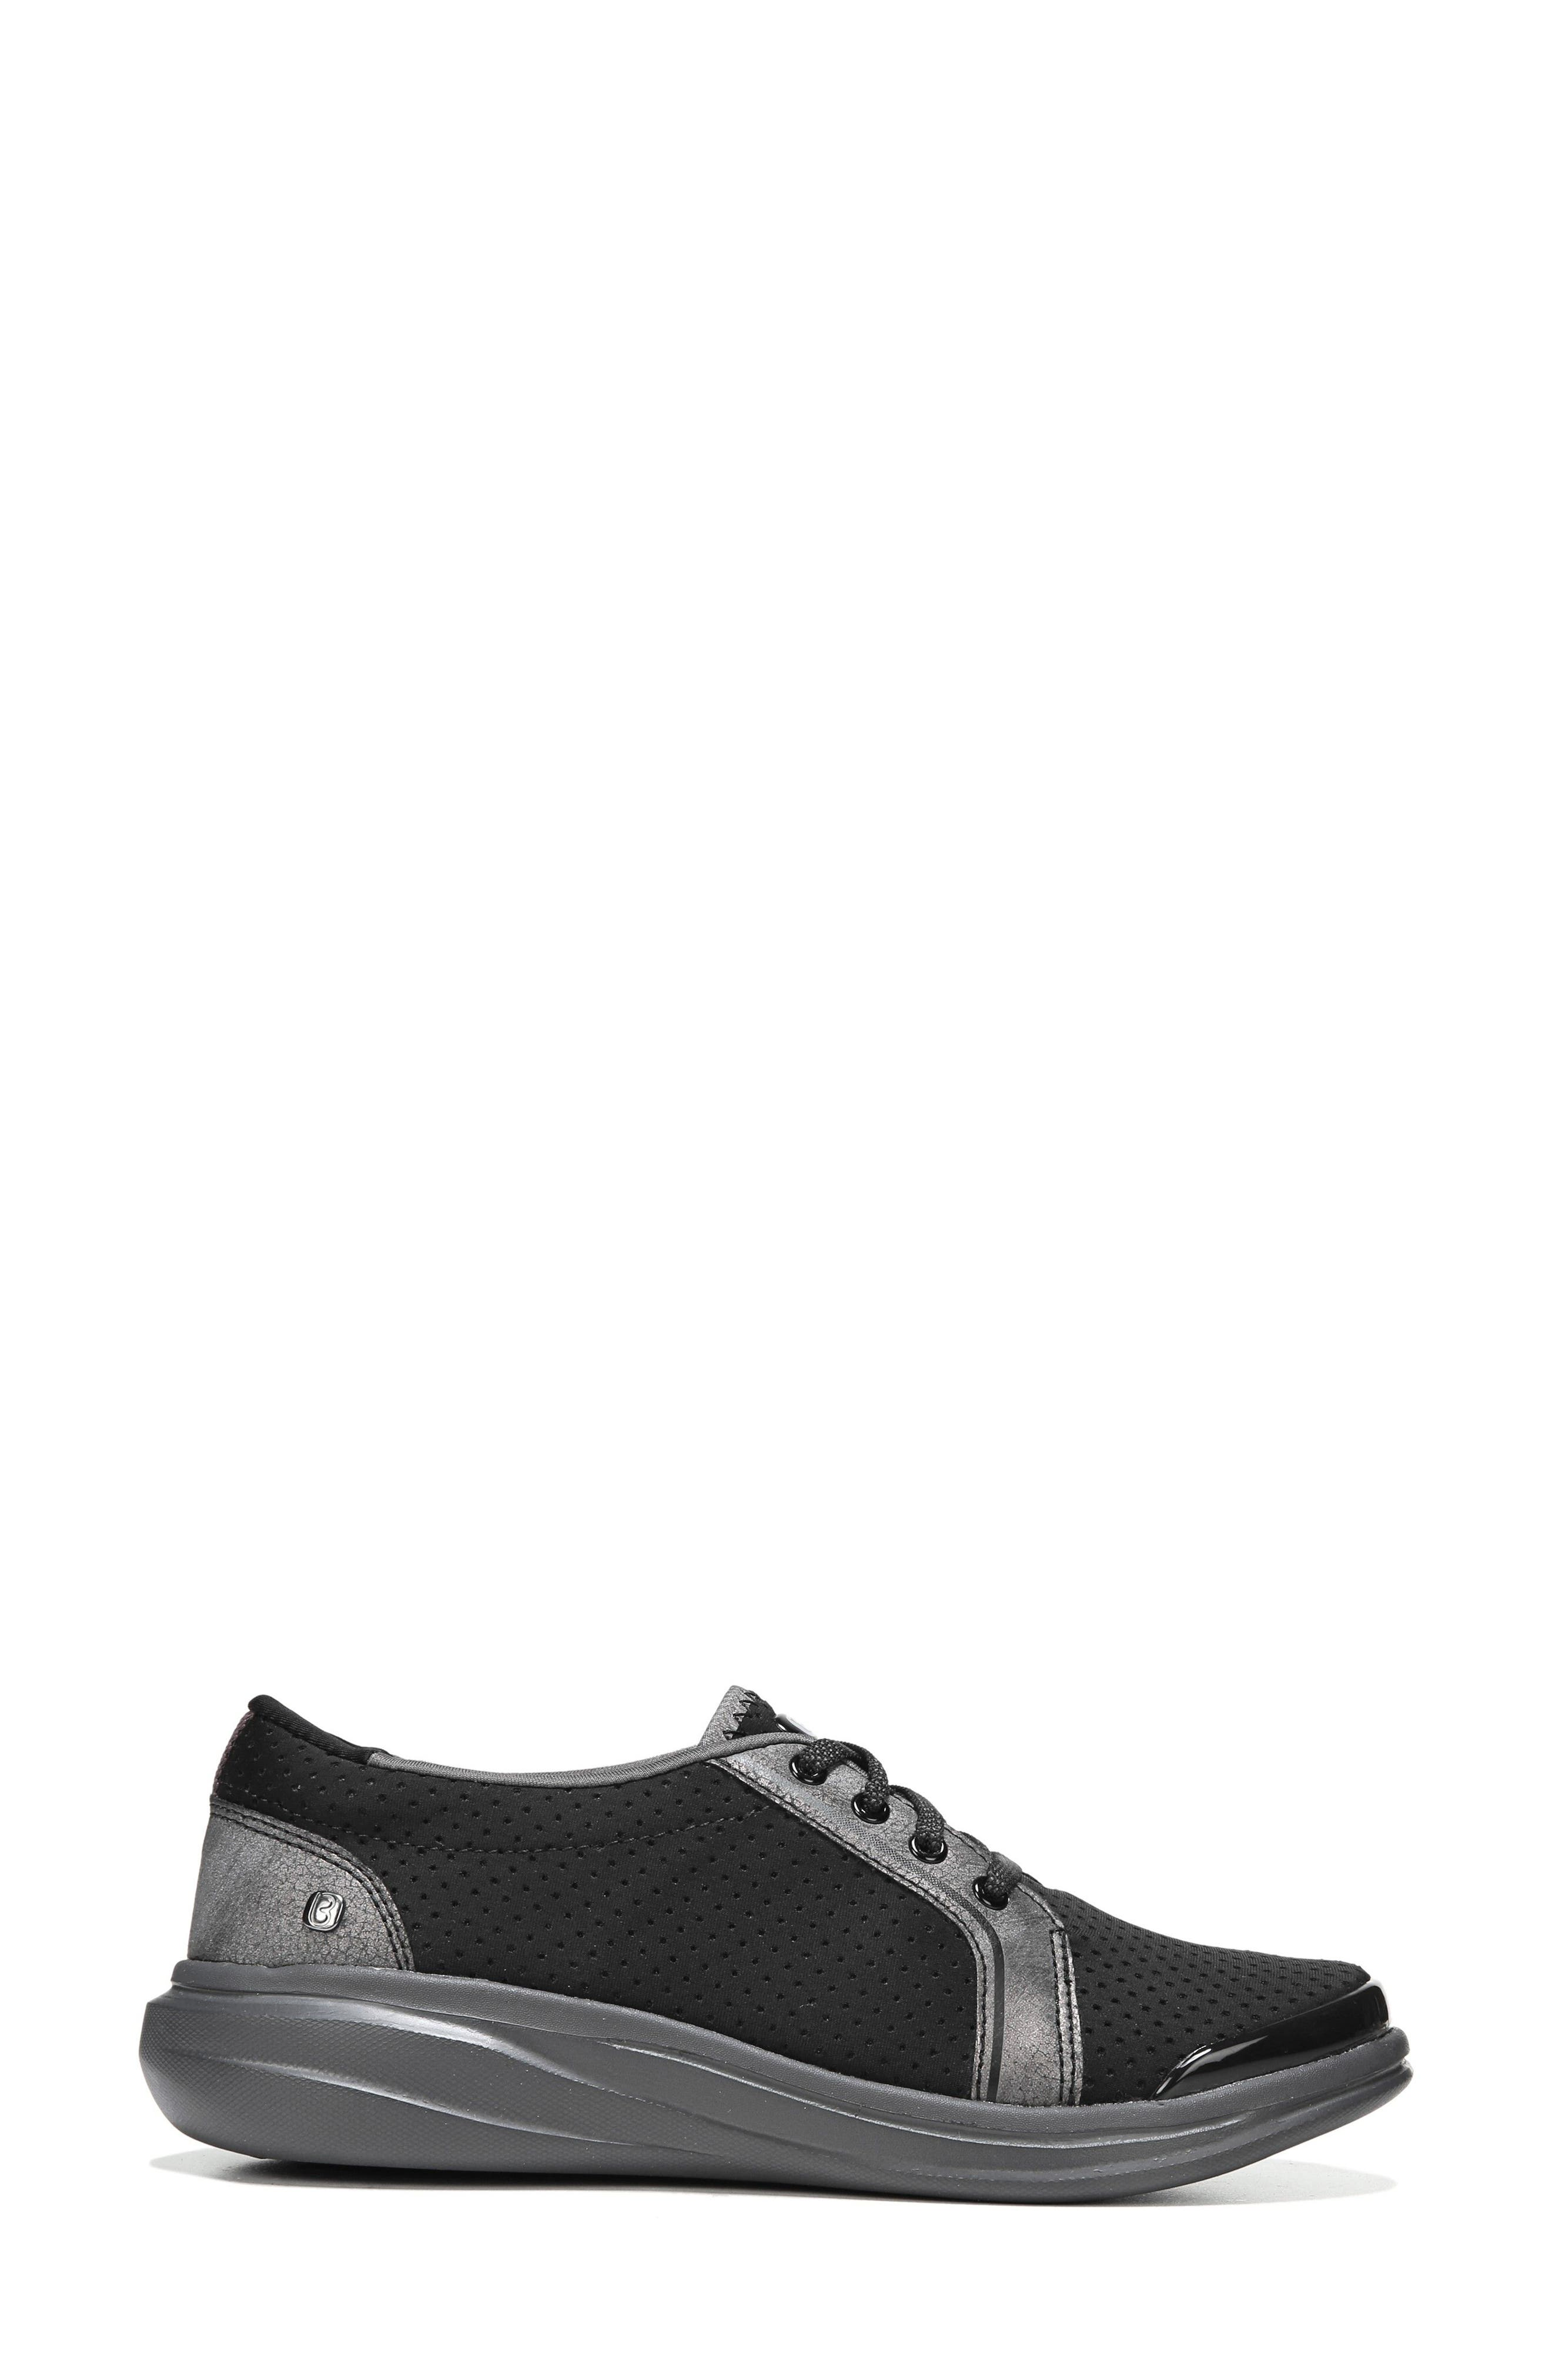 Capri Sneaker,                             Alternate thumbnail 3, color,                             003